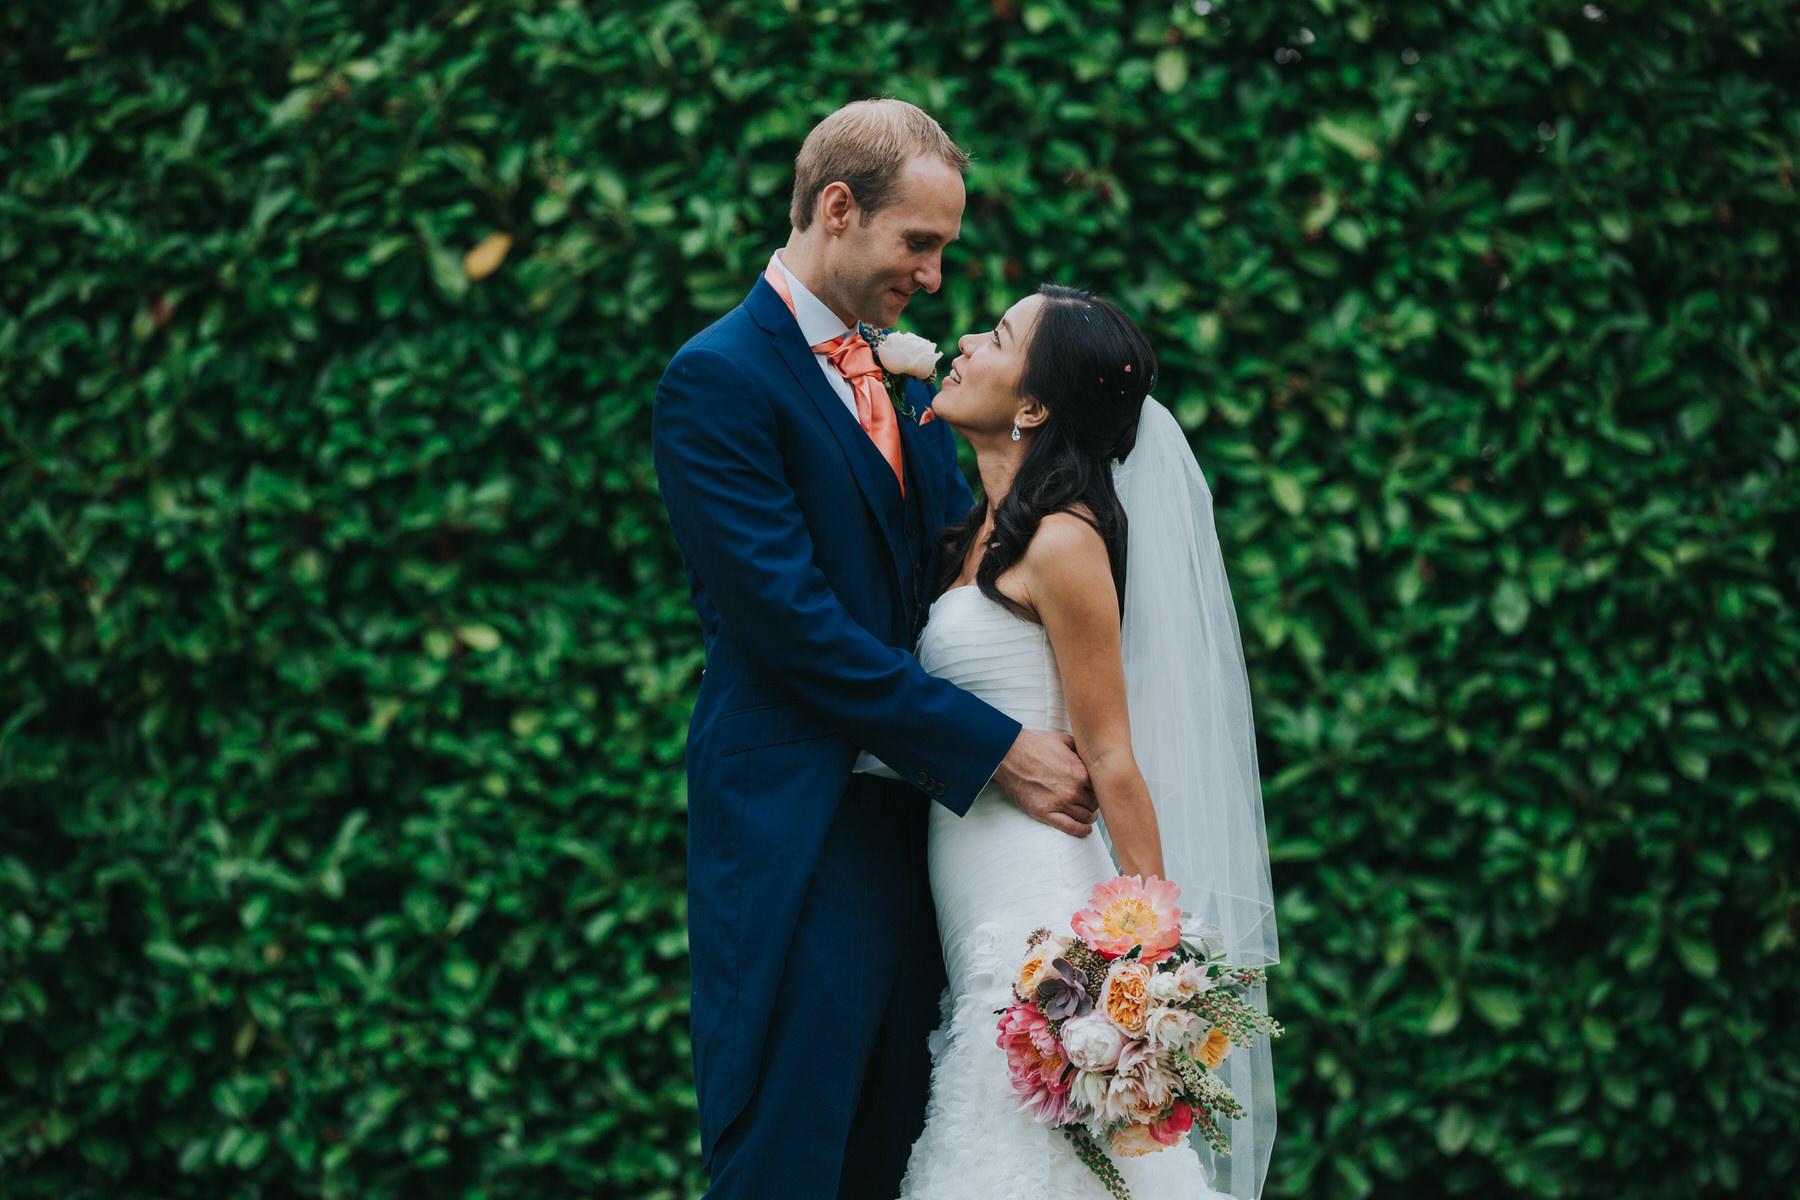 331 bride groom wedding portraits Woodlands Hotel green hedge.jpg